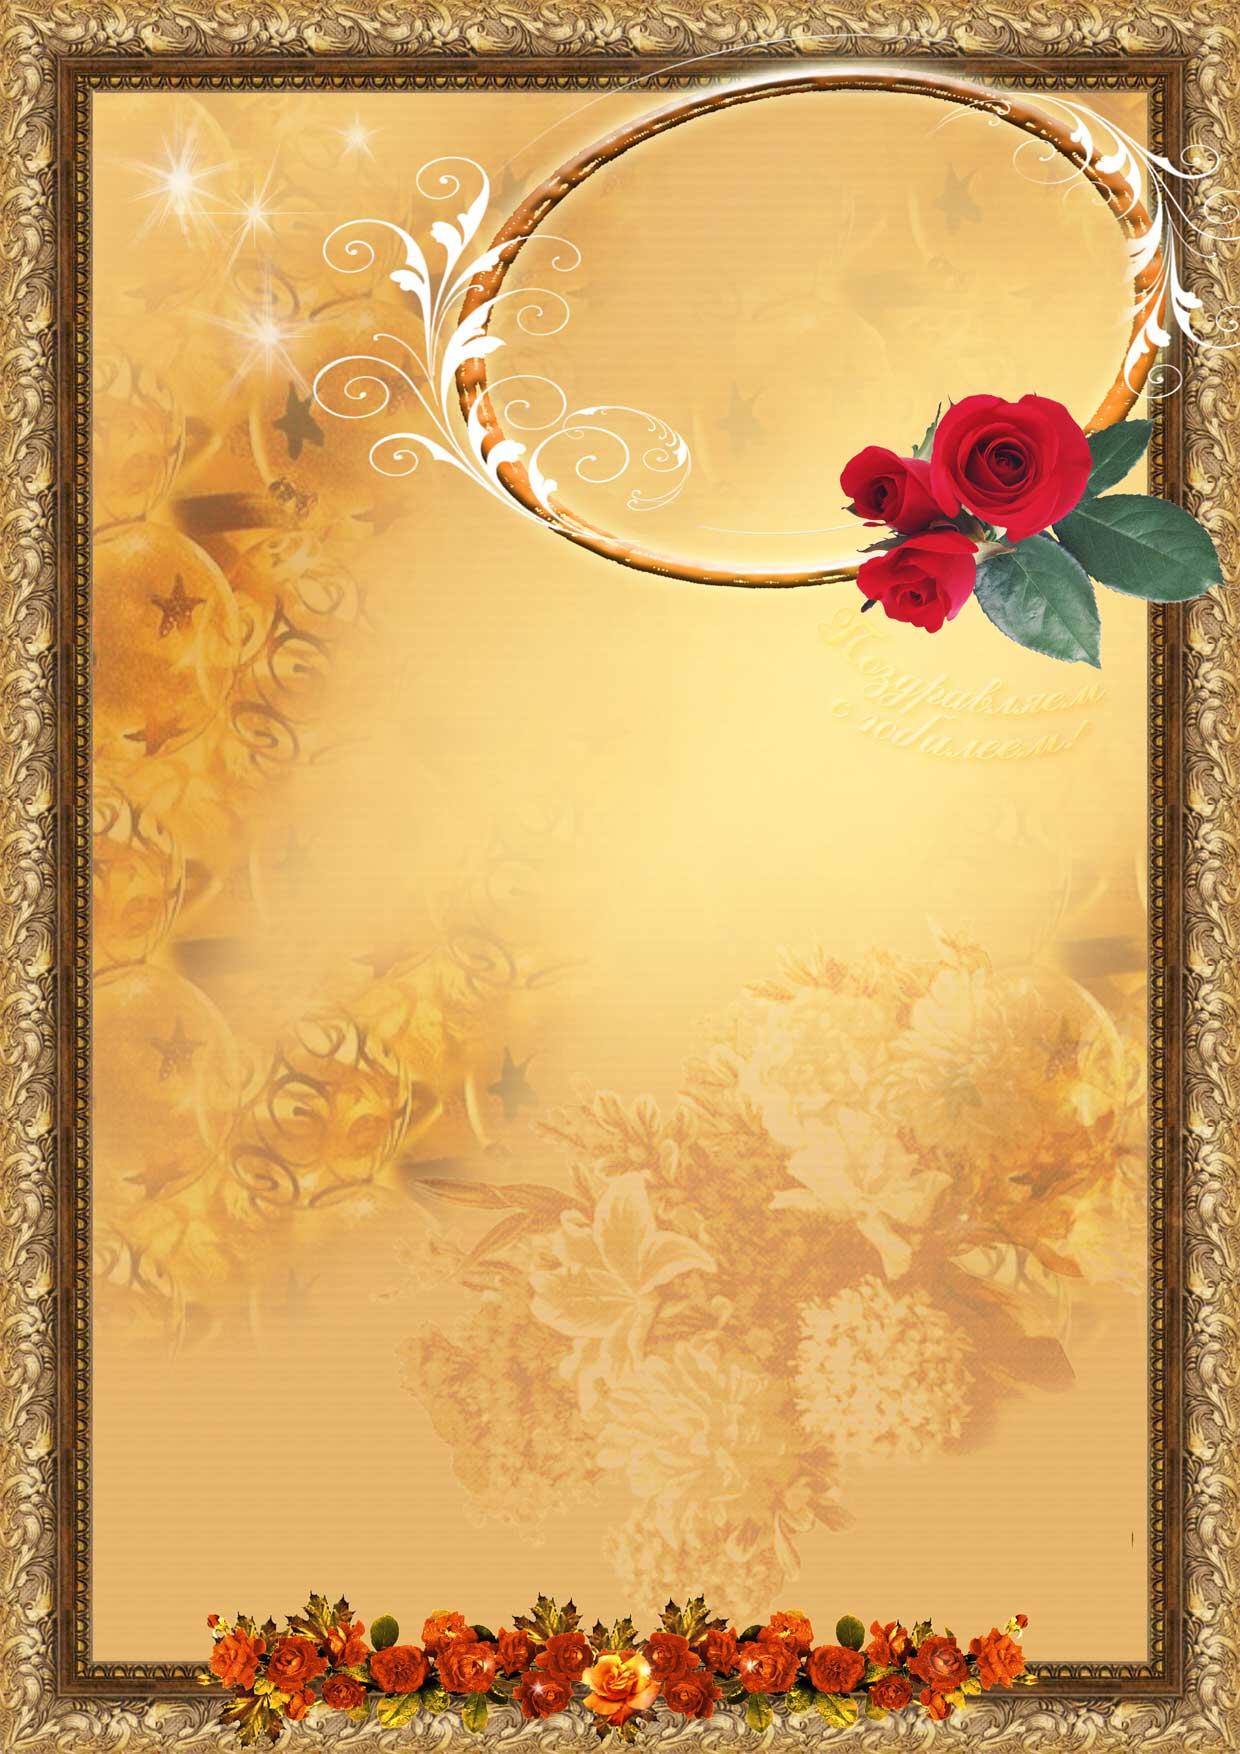 Яблоня, рамки открытки юбилеем 60 лет